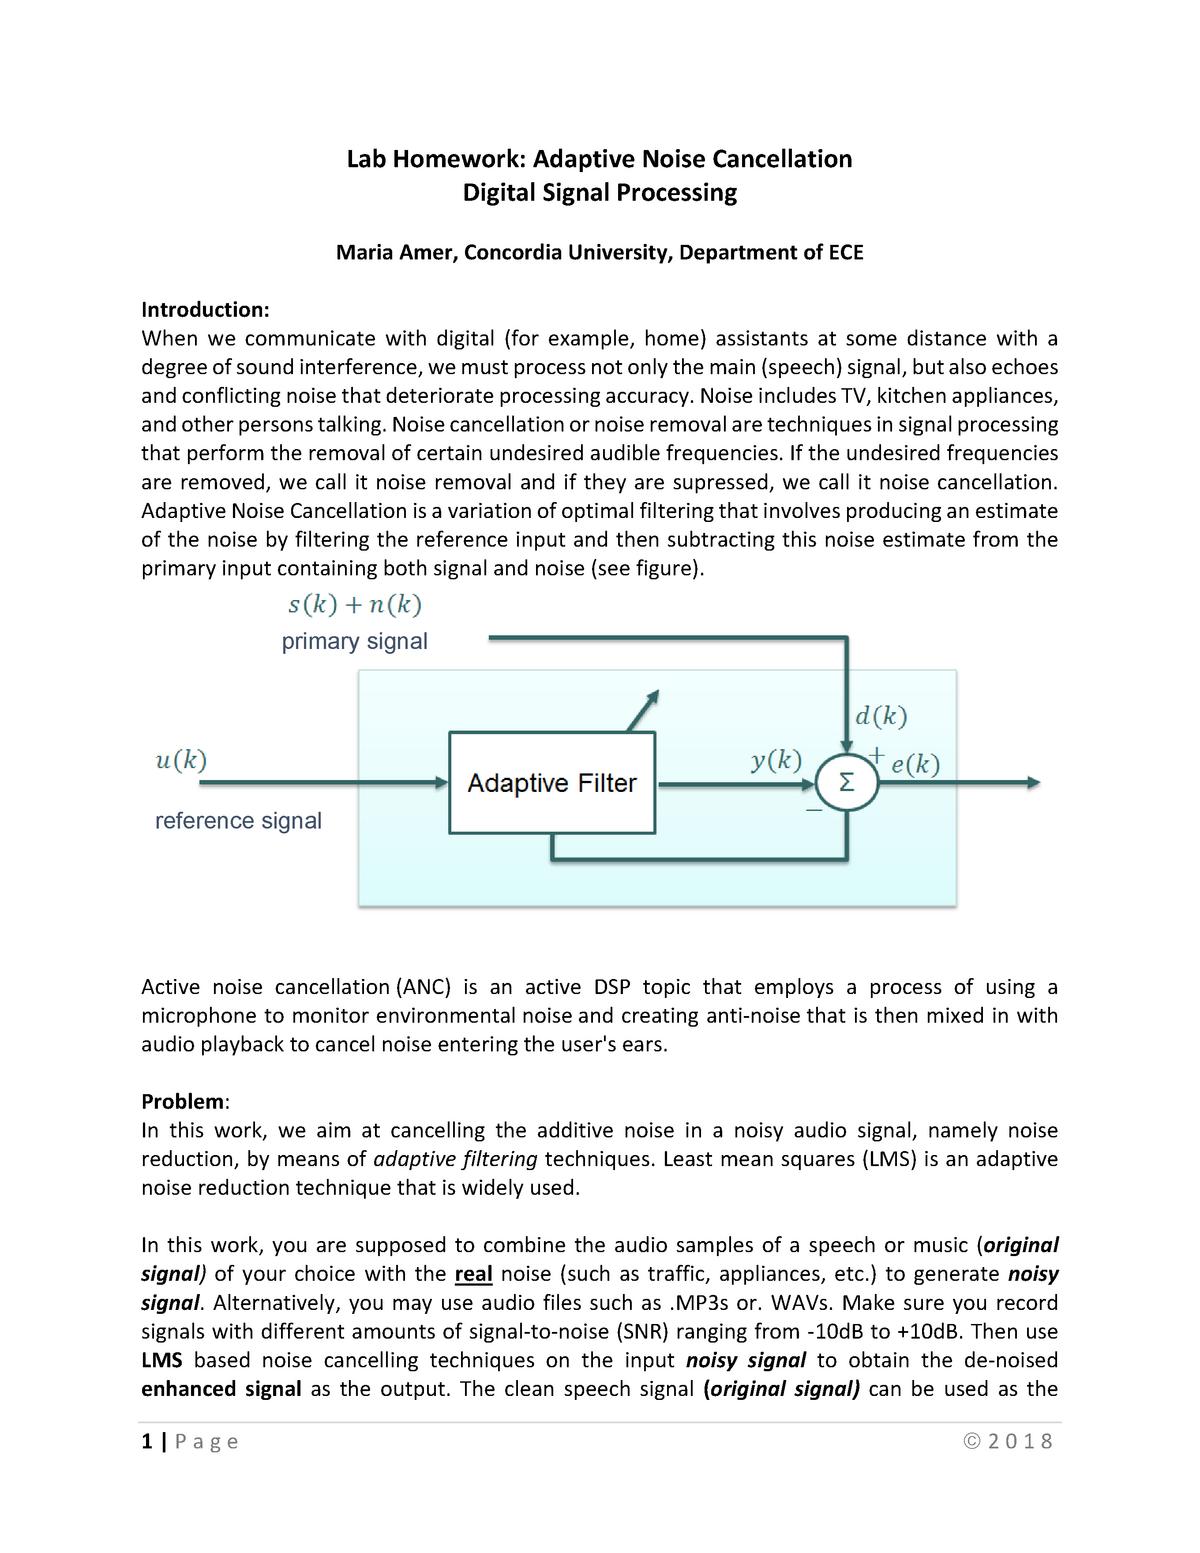 ELEC6601 Lab Homework - ELEC 442 Digital Signal Processing